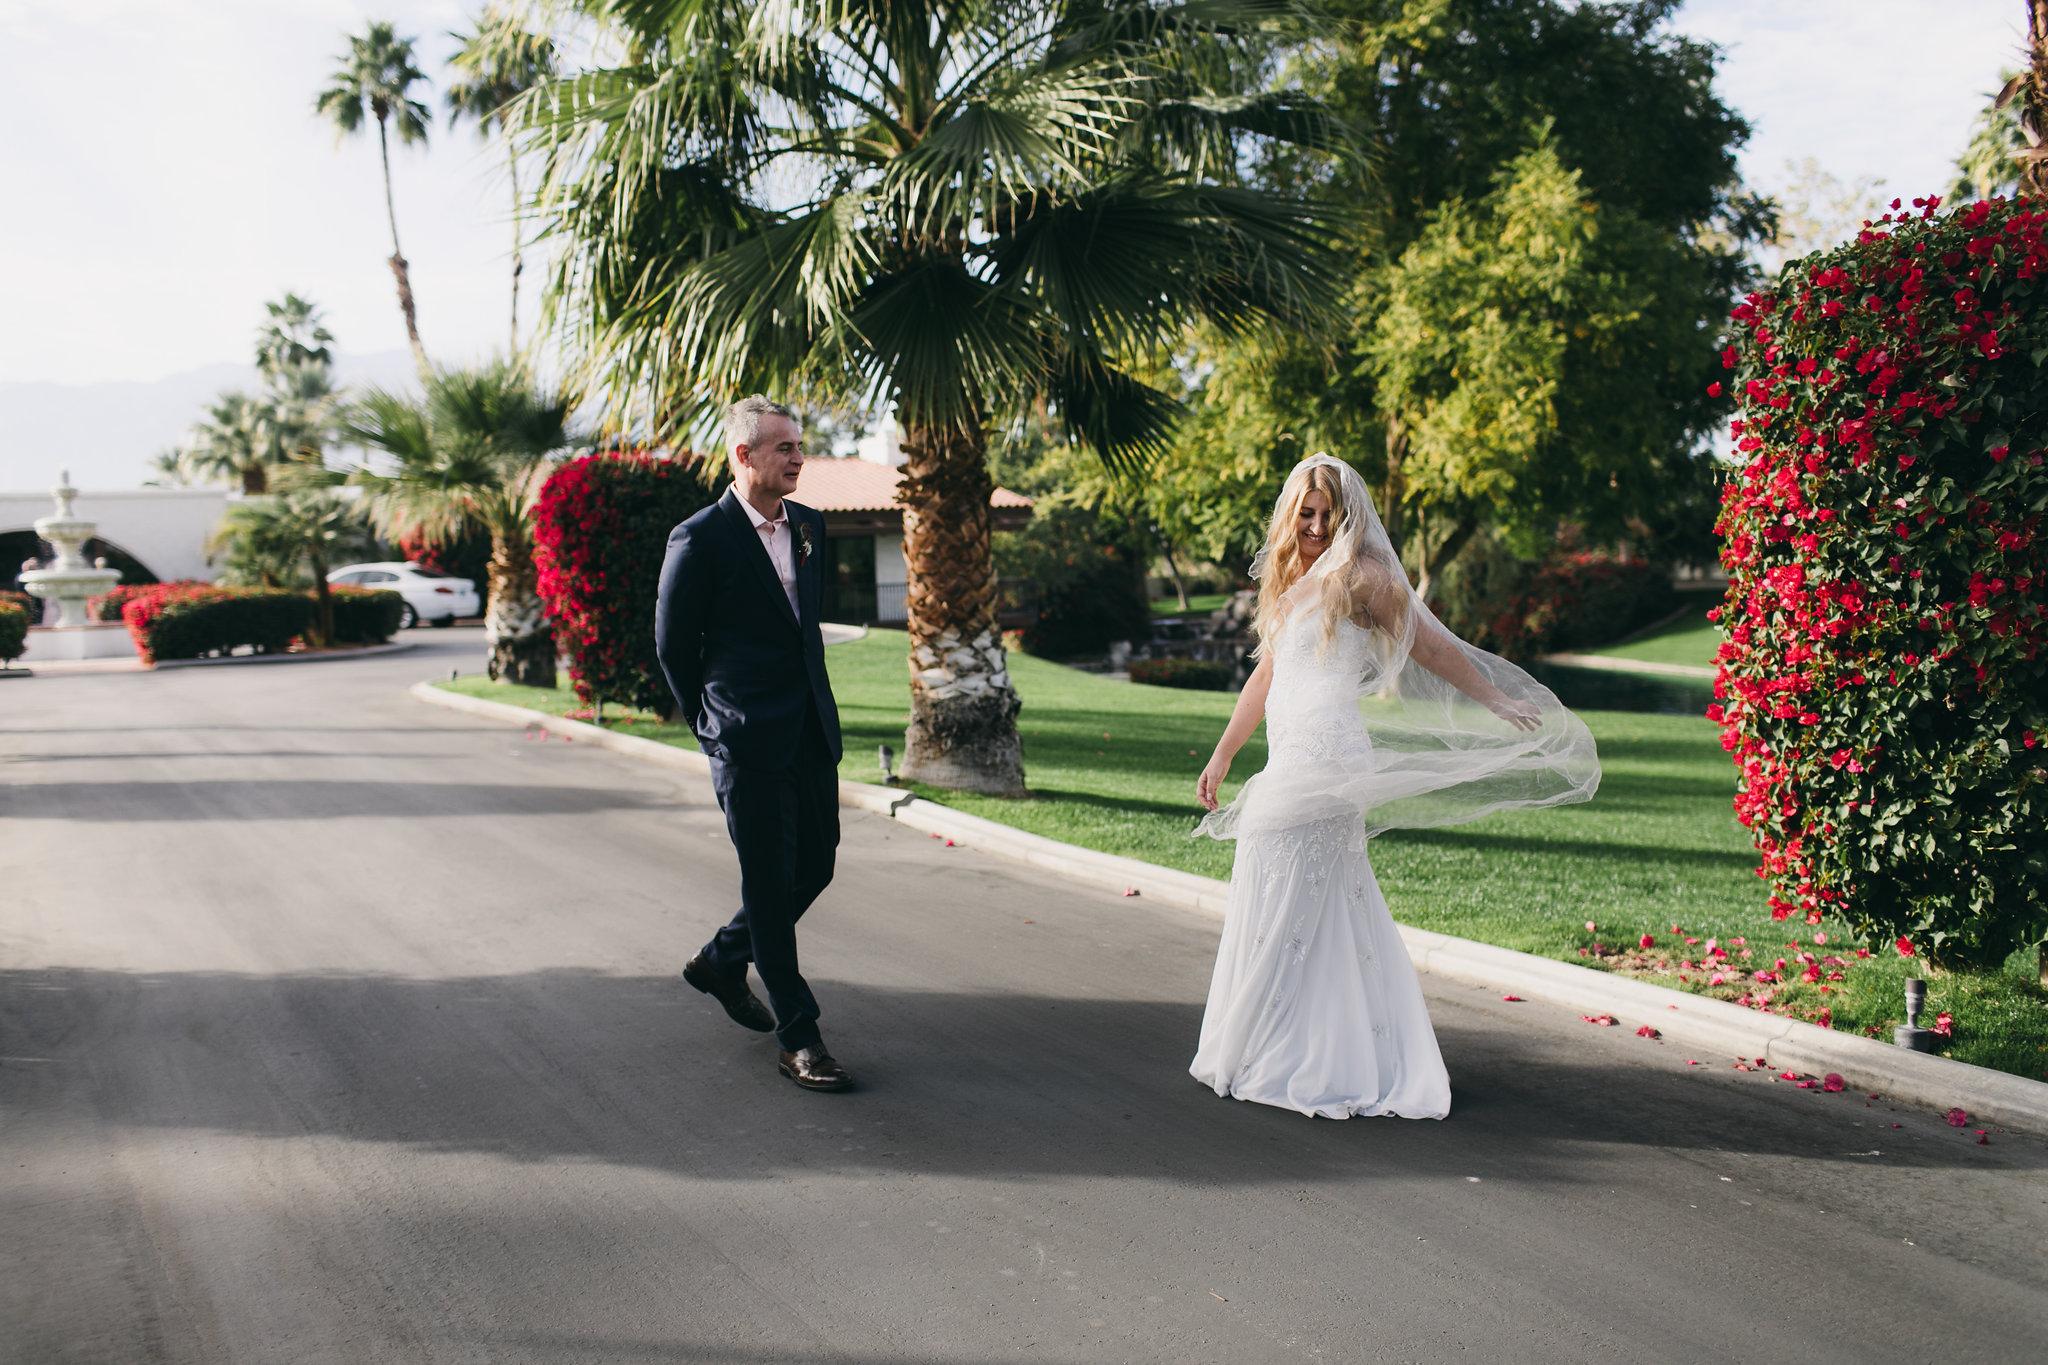 Gracy-Andrew-Wedding-167.jpg